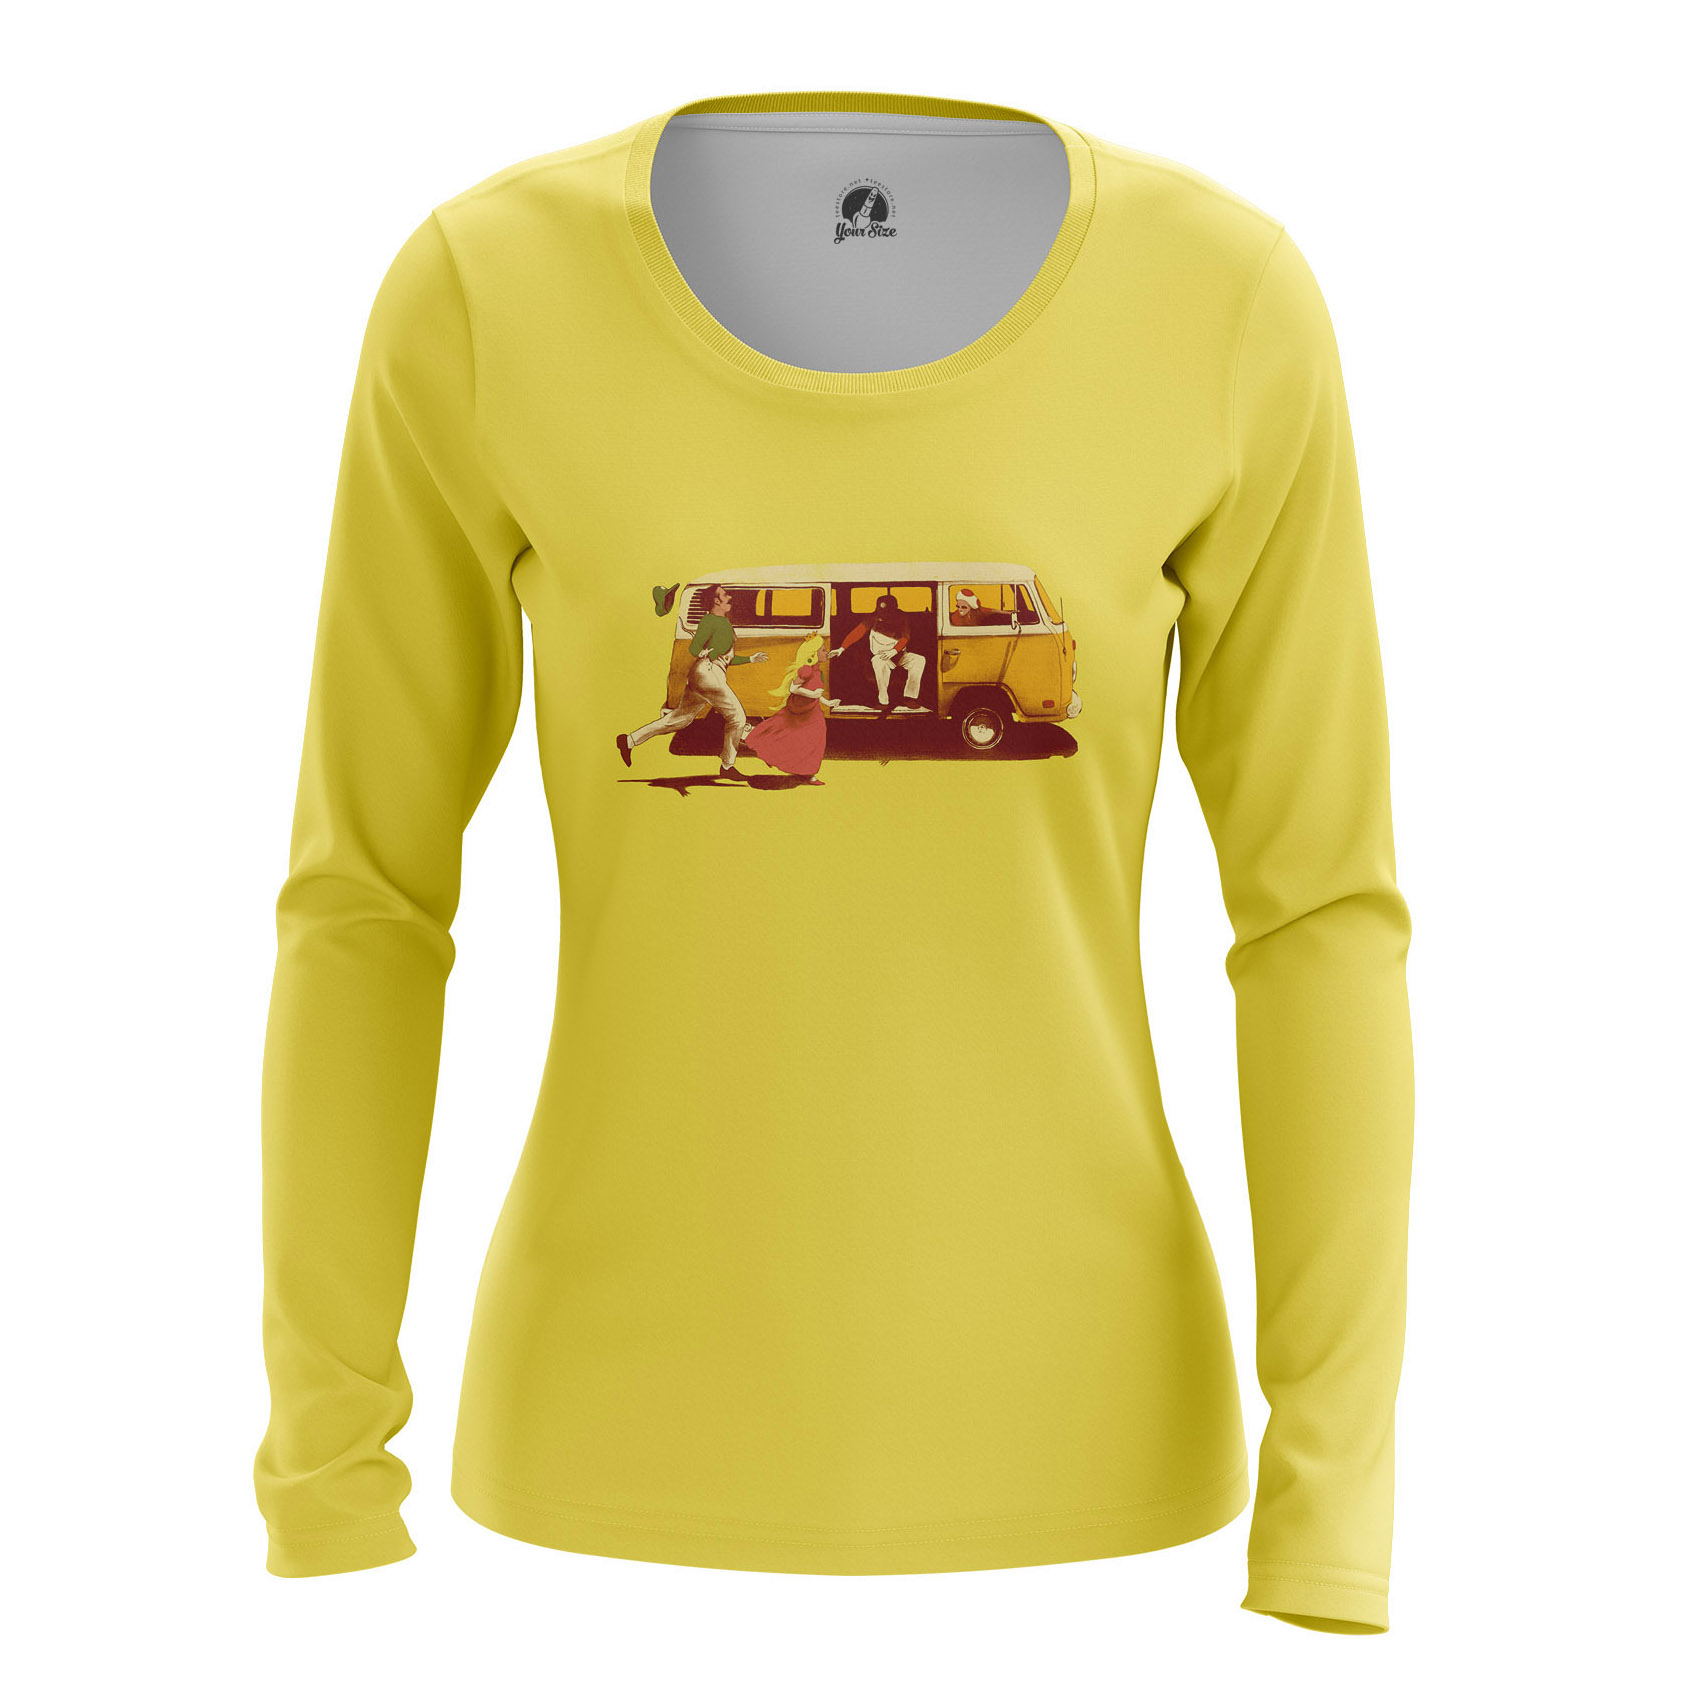 Merchandise Women'S Long Sleeve Mario Broth. Princess Nintendo Dendy